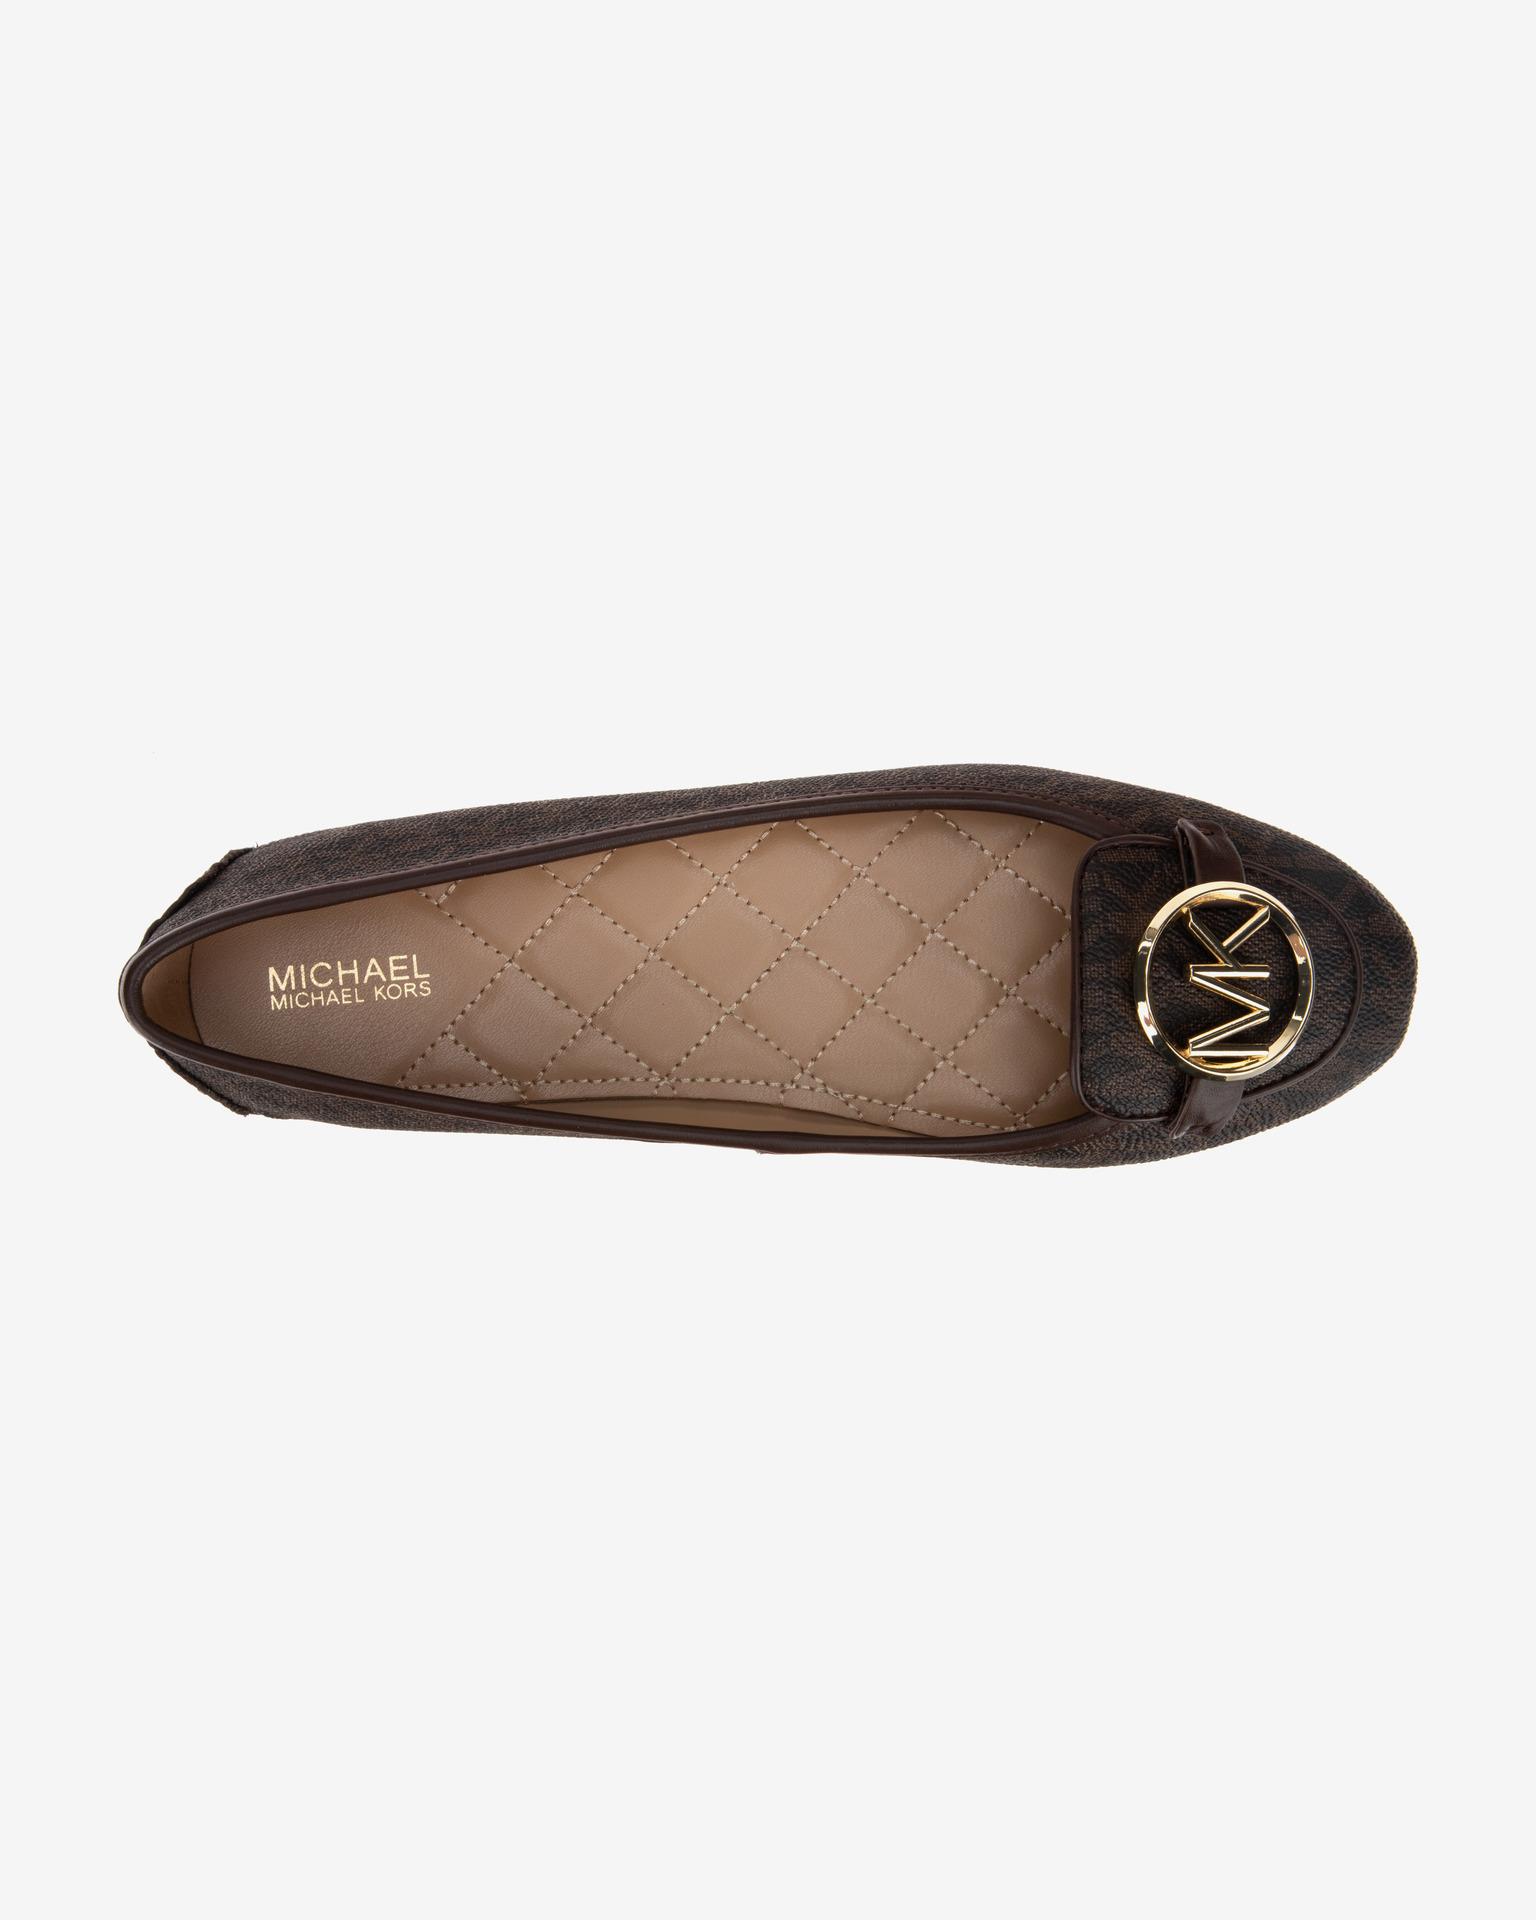 737509ff17 Michael Kors - Lilie Balerina cipő | Bibloo.hu